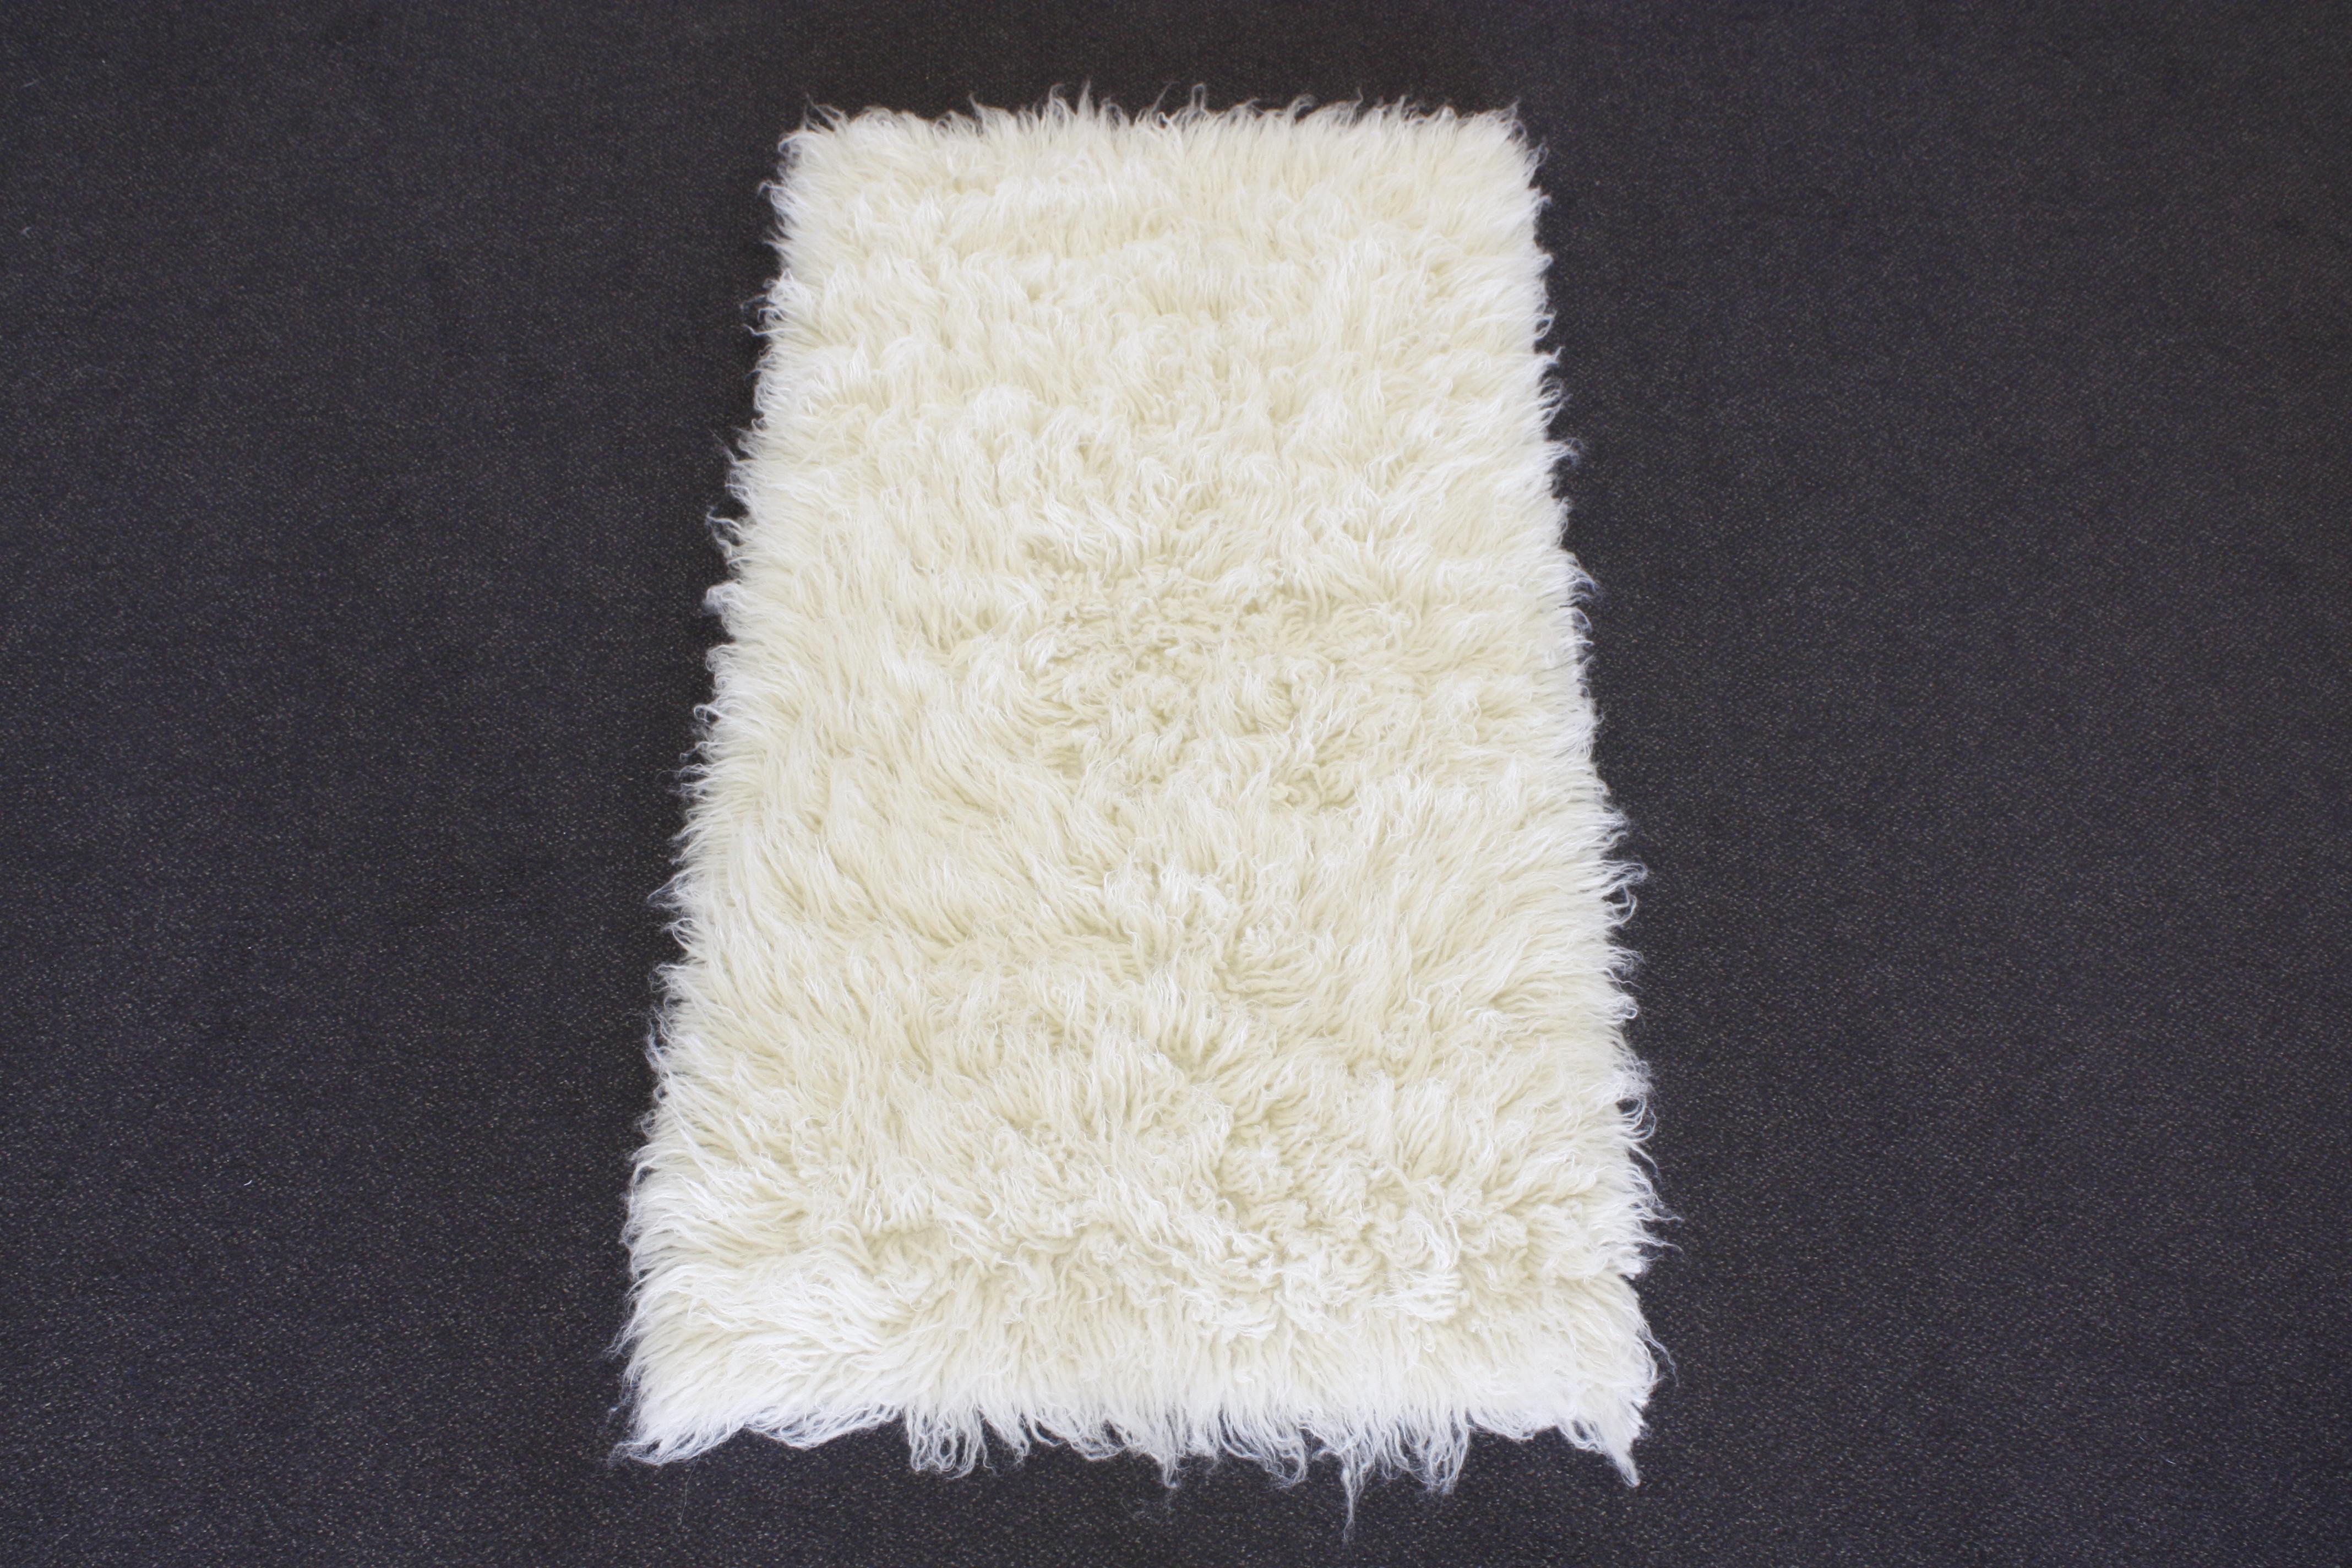 Flokati tappeto a pelo lungo 120x180cm natura 1500 g m m - Tappeto a pelo lungo ...